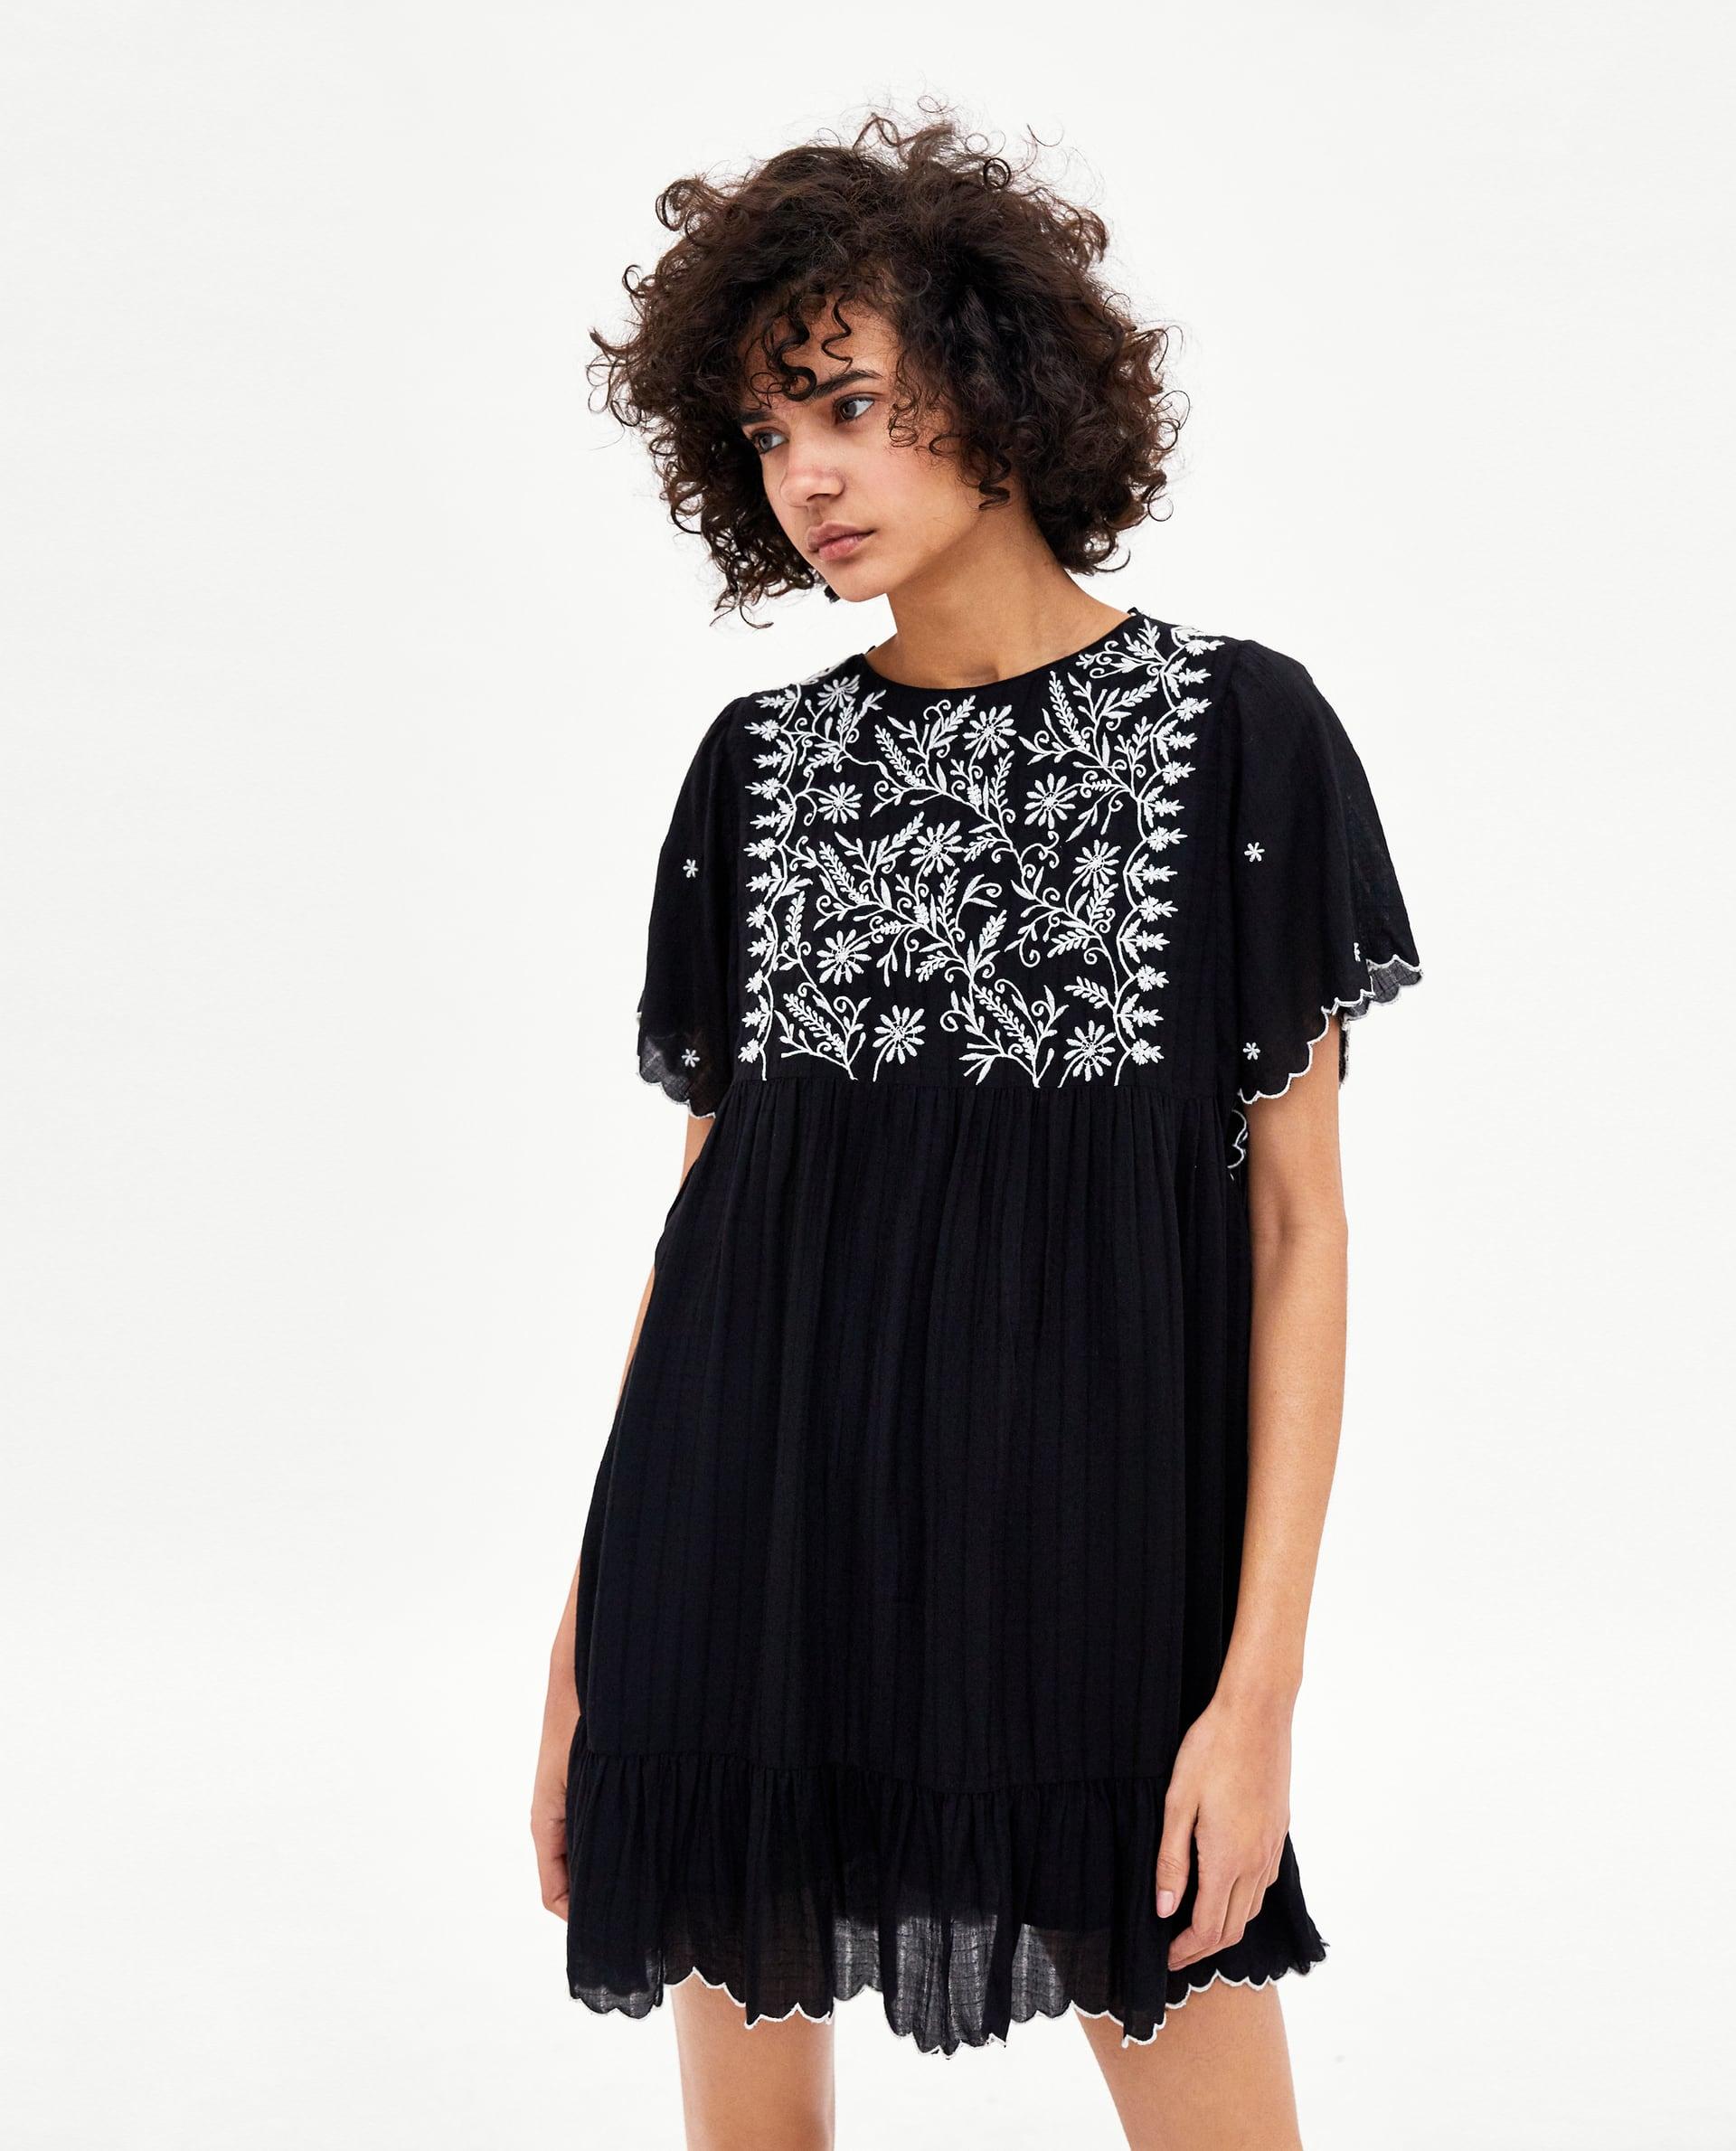 Zara-SHORT-EMBROIDERED-JUMPSUIT-DRESS-black.jpg